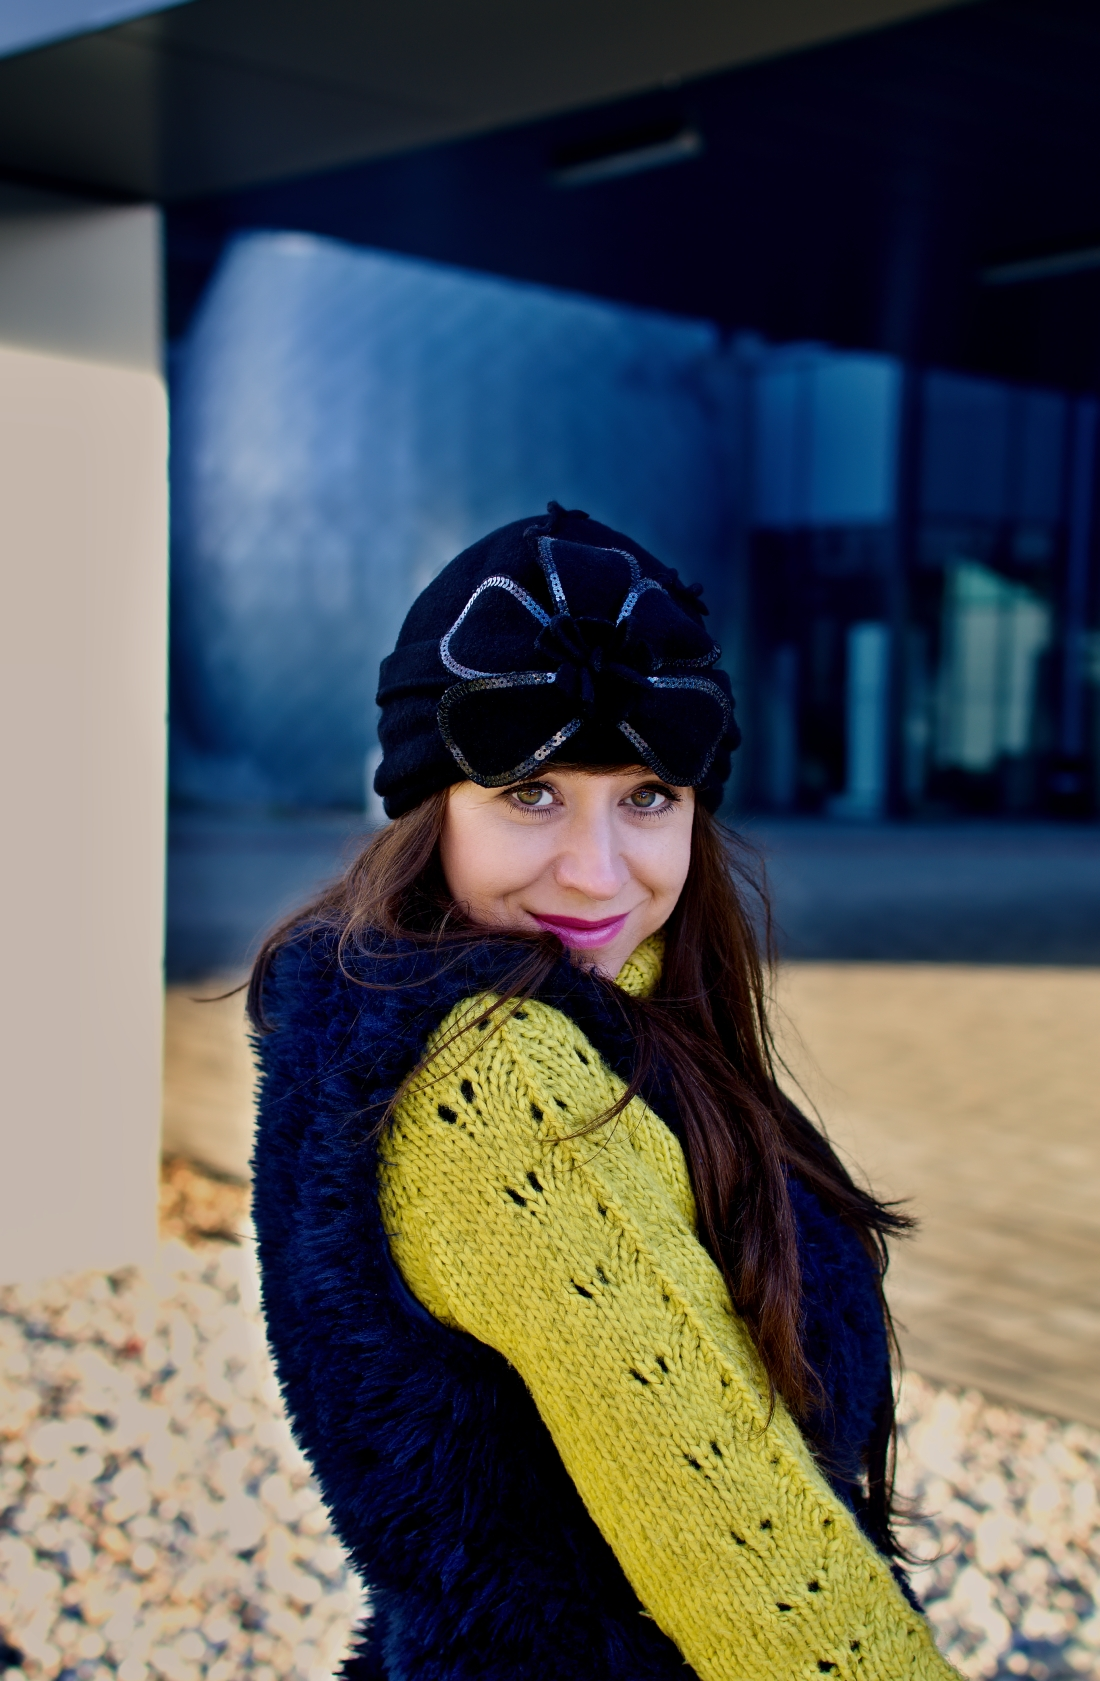 IRRESISTIBLE ME_Katharine-fashion is beautiful_blog 12_hair extension_irresistible me_beauty_Modrá kožušinová vesta_Katarína Jakubčová_Fashion blogger